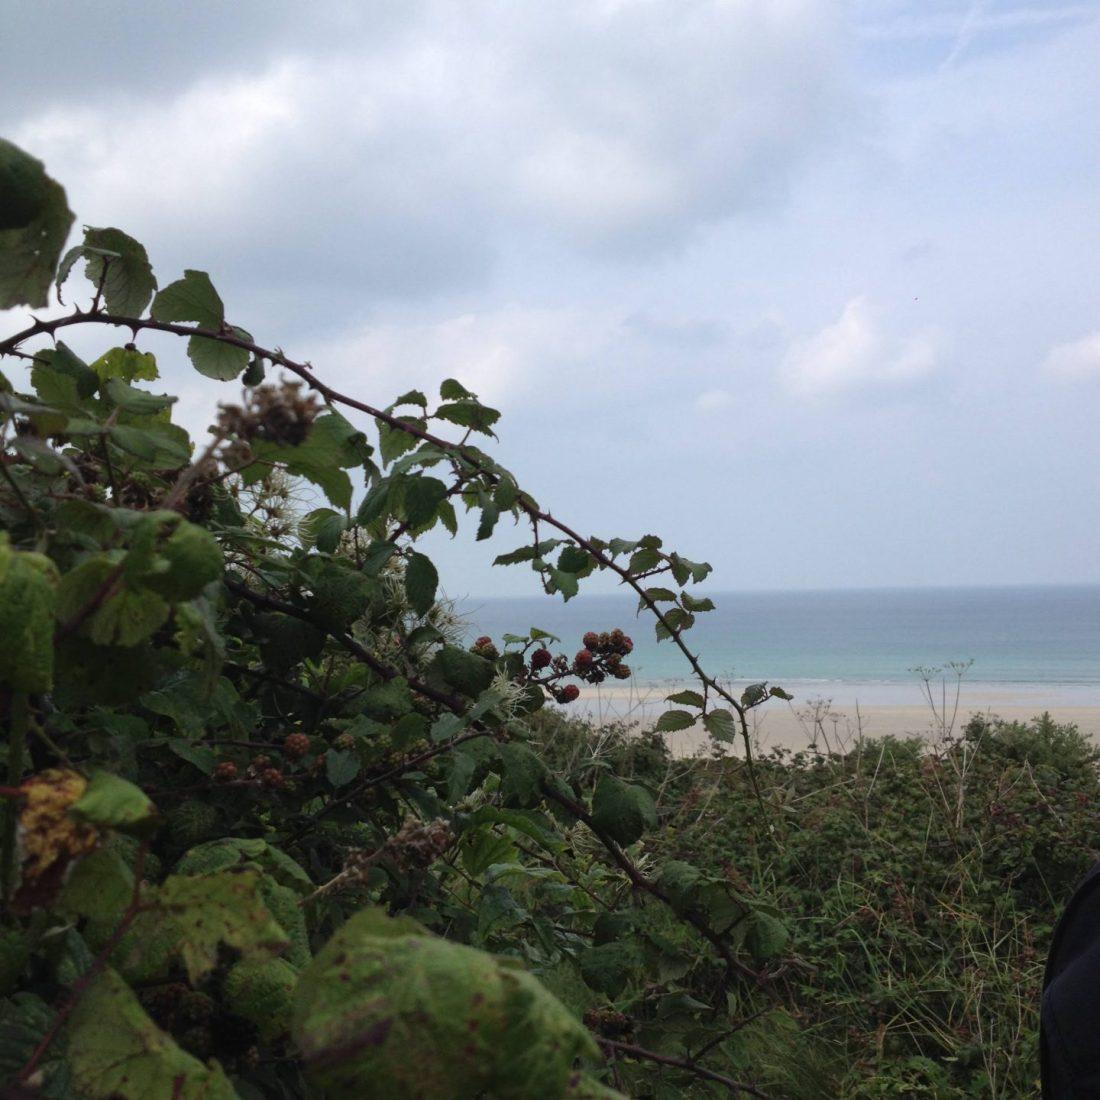 Views across Porthkidney Beach, Cornwall